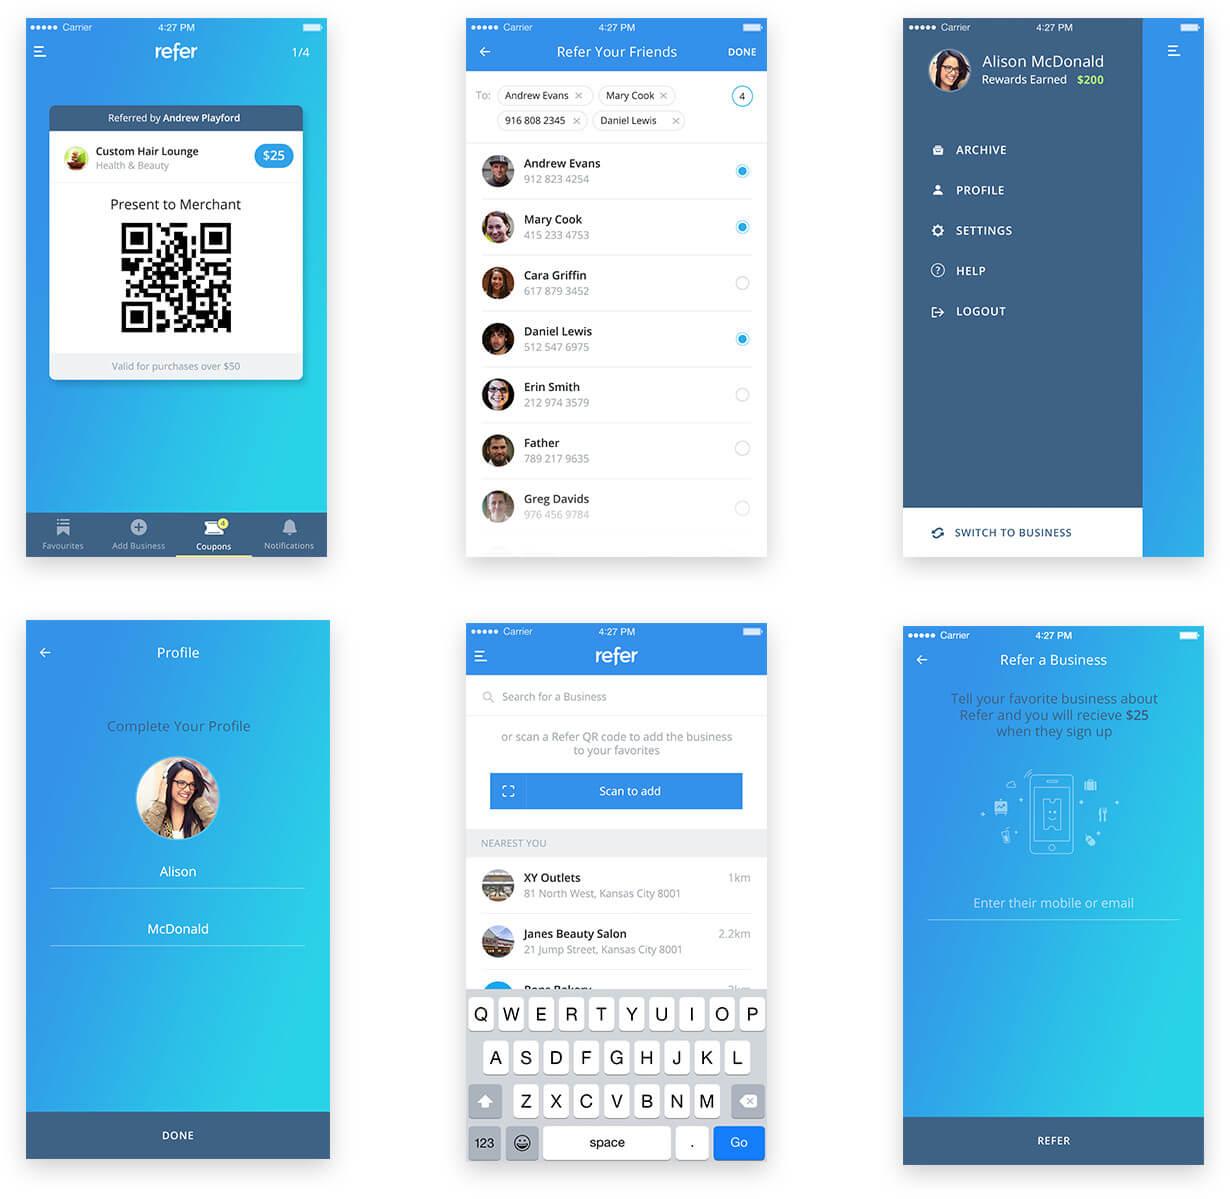 Refer Mobile App Screen Designs